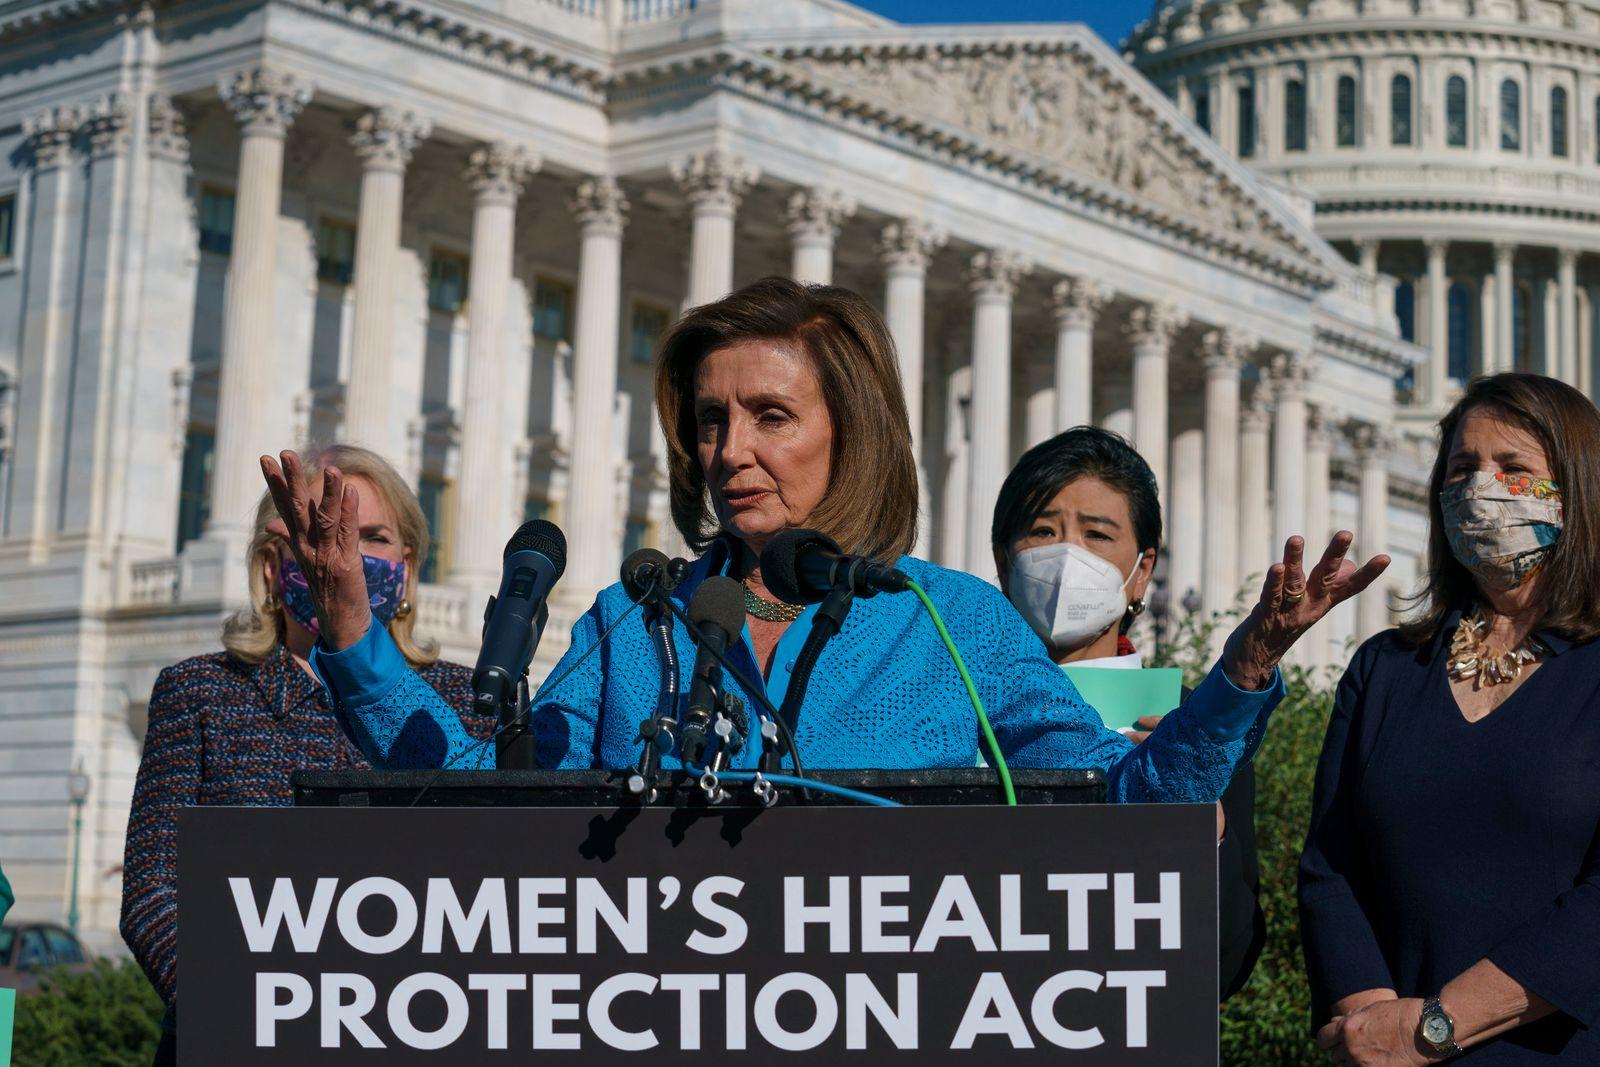 Nancy Pelosi, Sylvia Garcia, Judy Chu, Diana DeGette